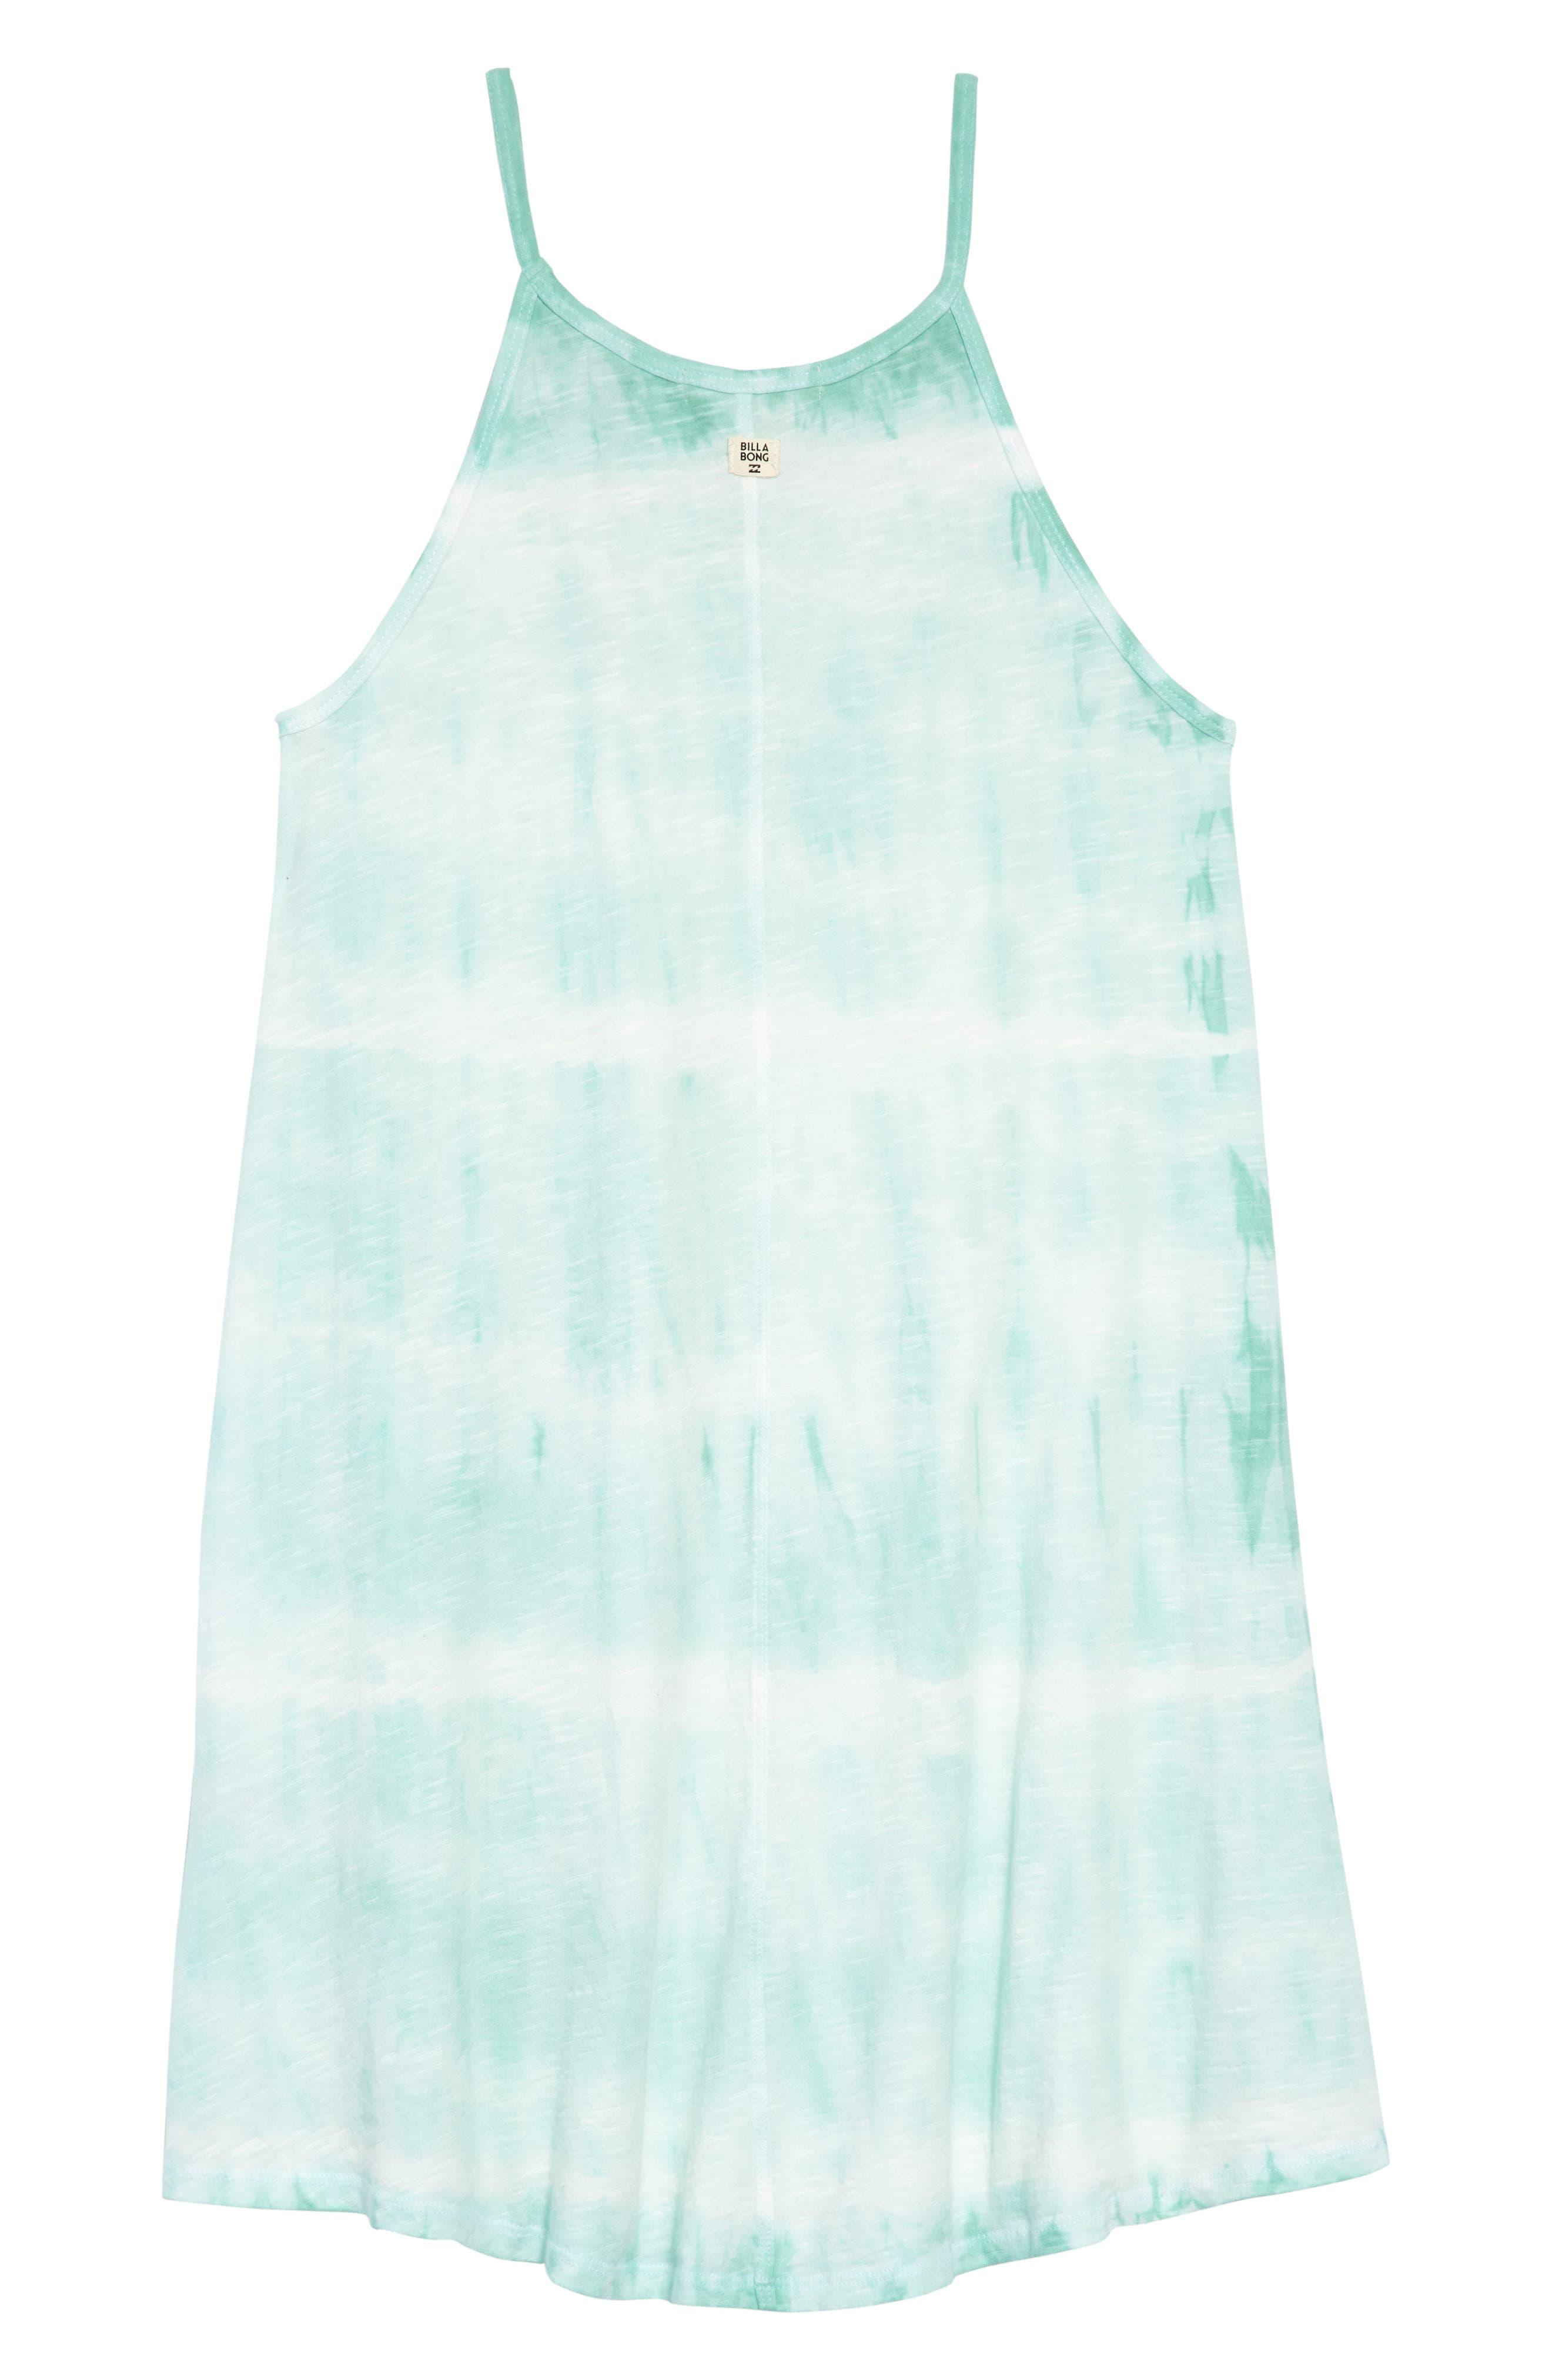 Namaste All Day Tie-Dye Dress,                             Alternate thumbnail 2, color,                             Beach Glass